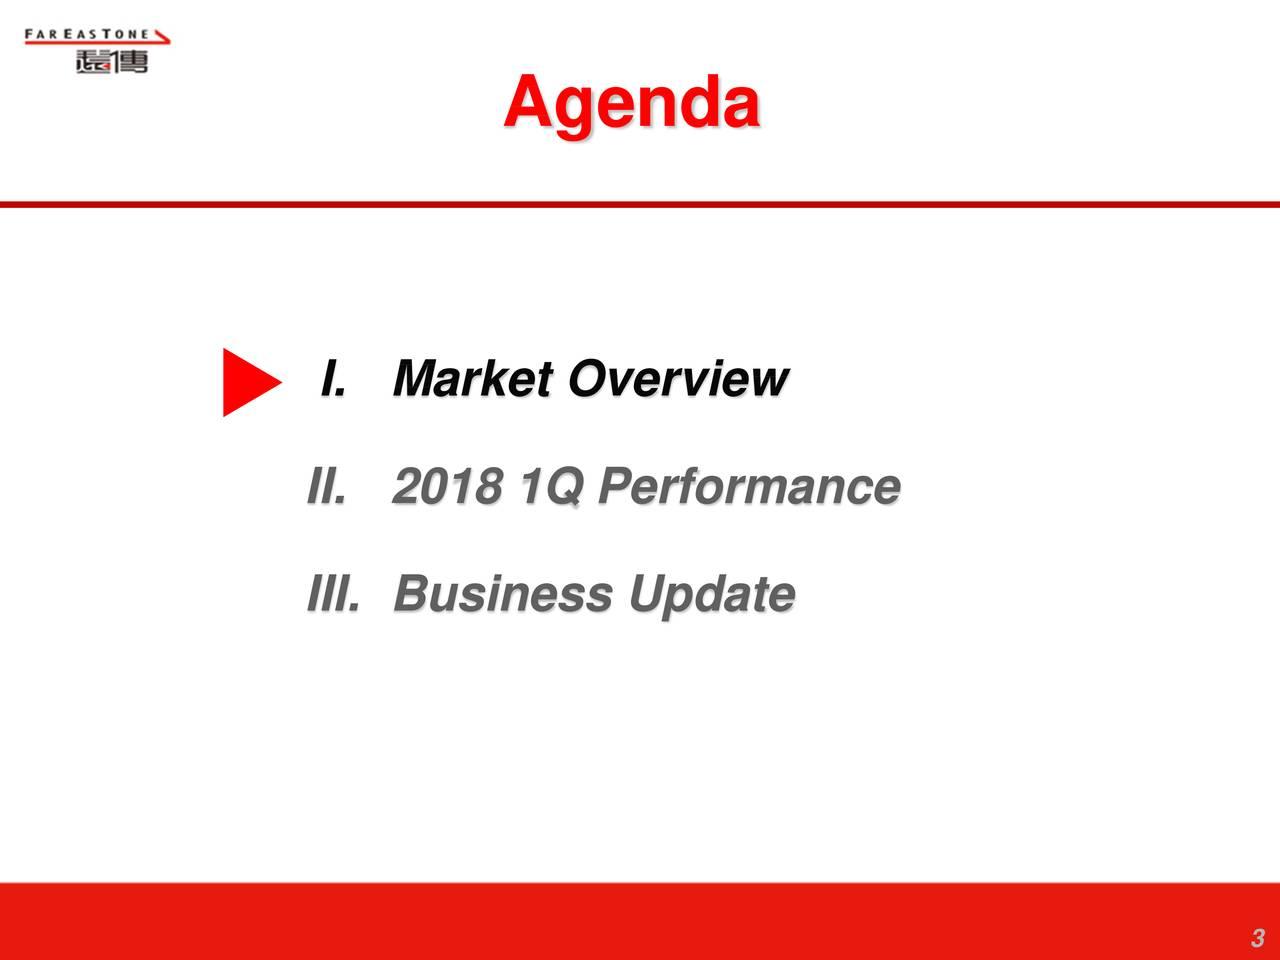 I. Market Overview II. 2018 1Q Performance III. Business Update